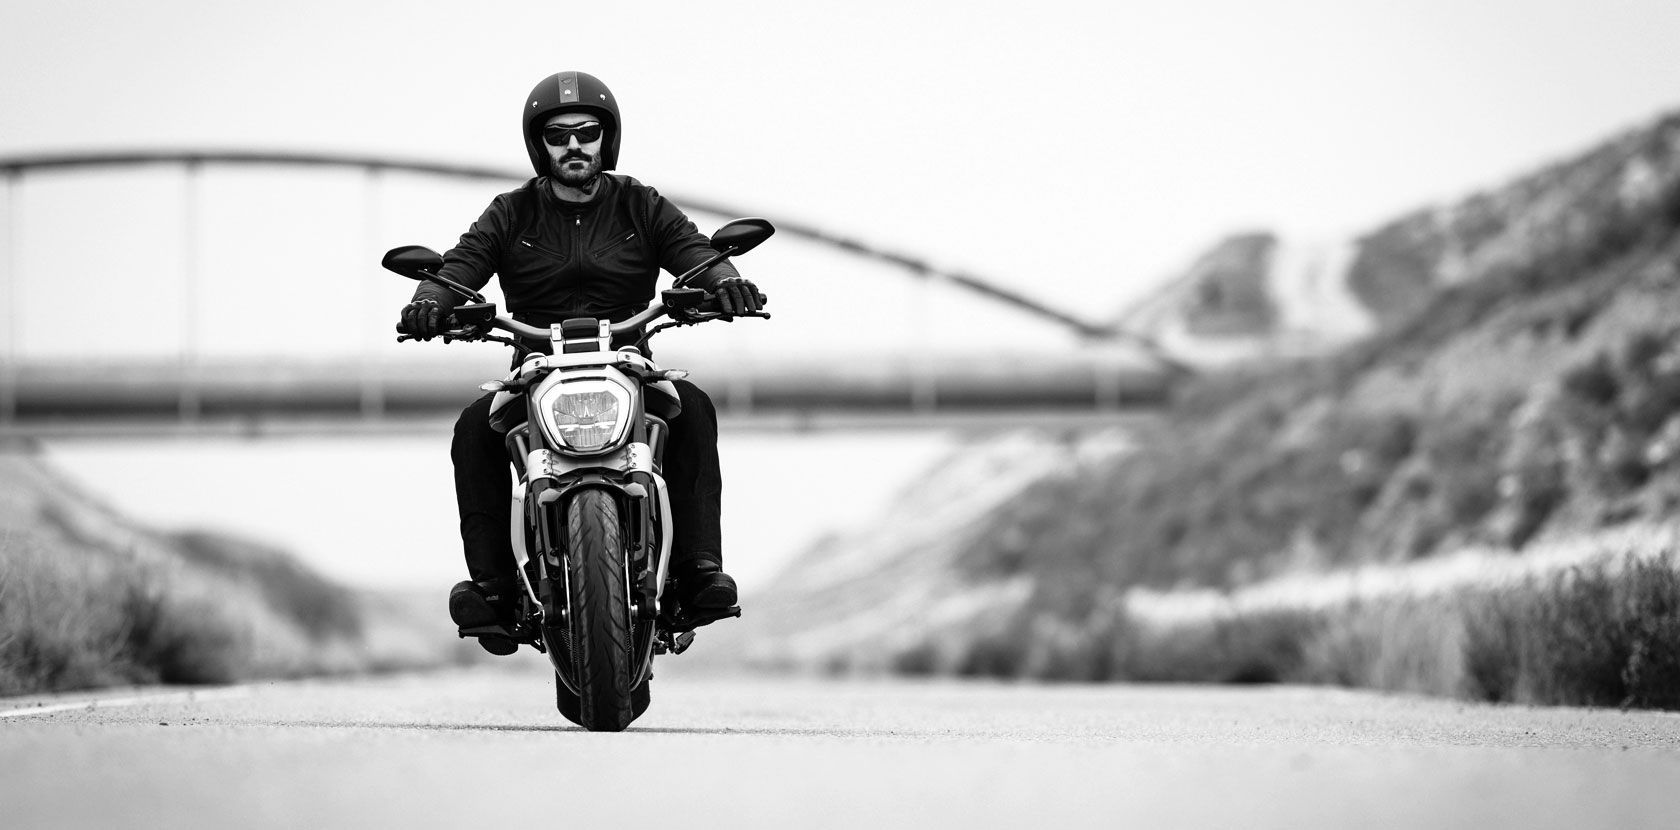 2016 Ducati XDiavel S | XDiavel - Front Ride Shot